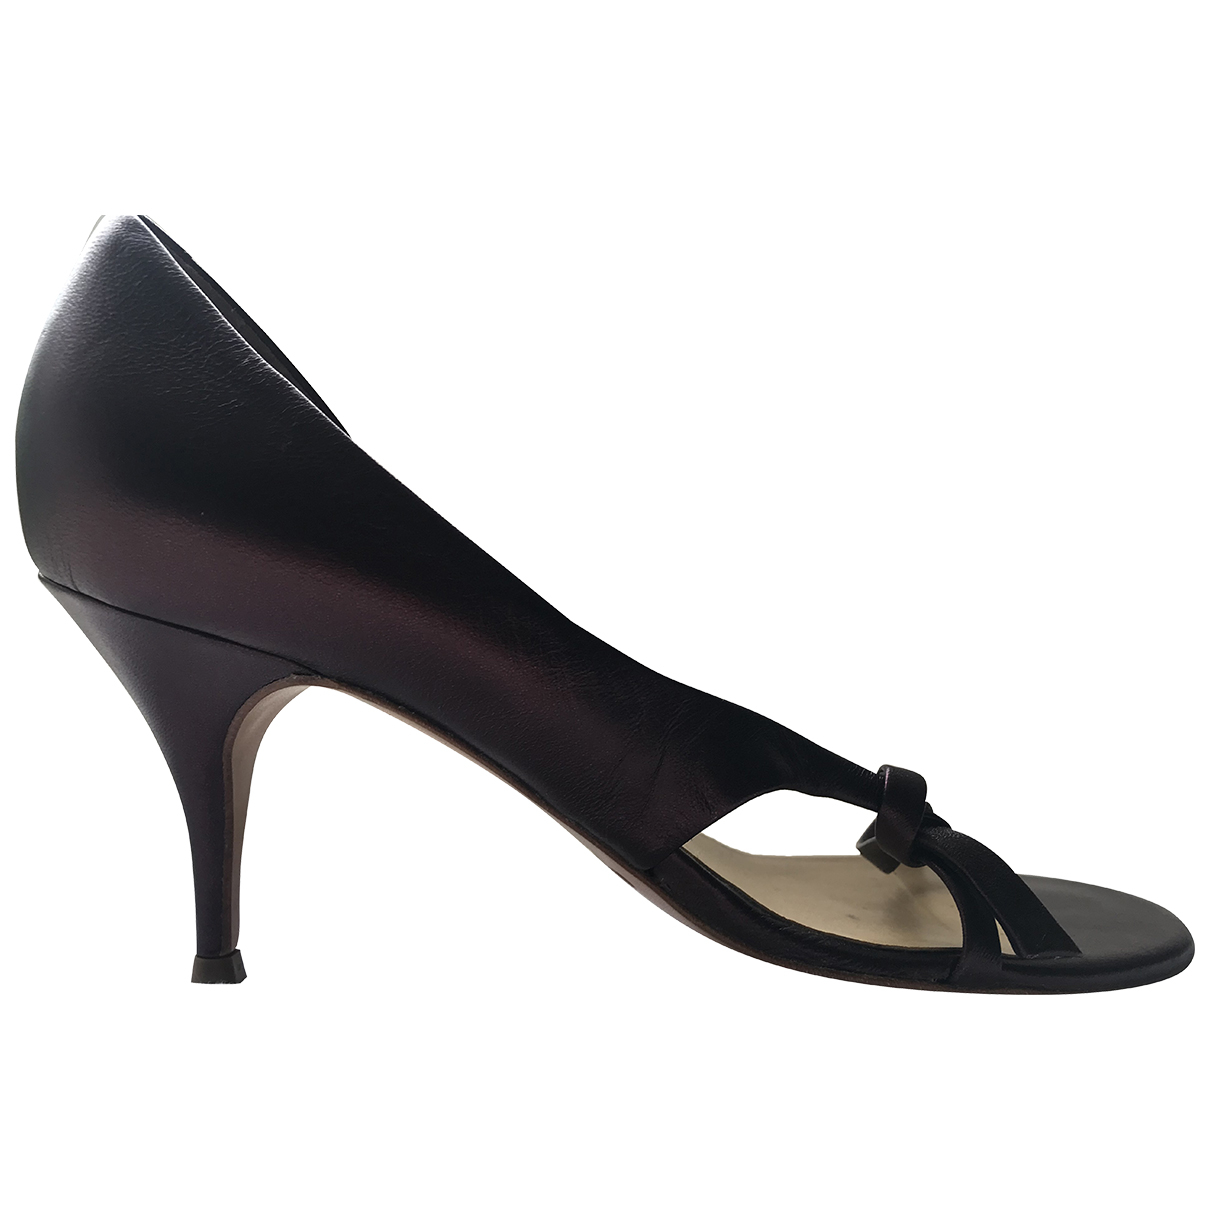 Chloé \N Leather Sandals for Women 36 EU